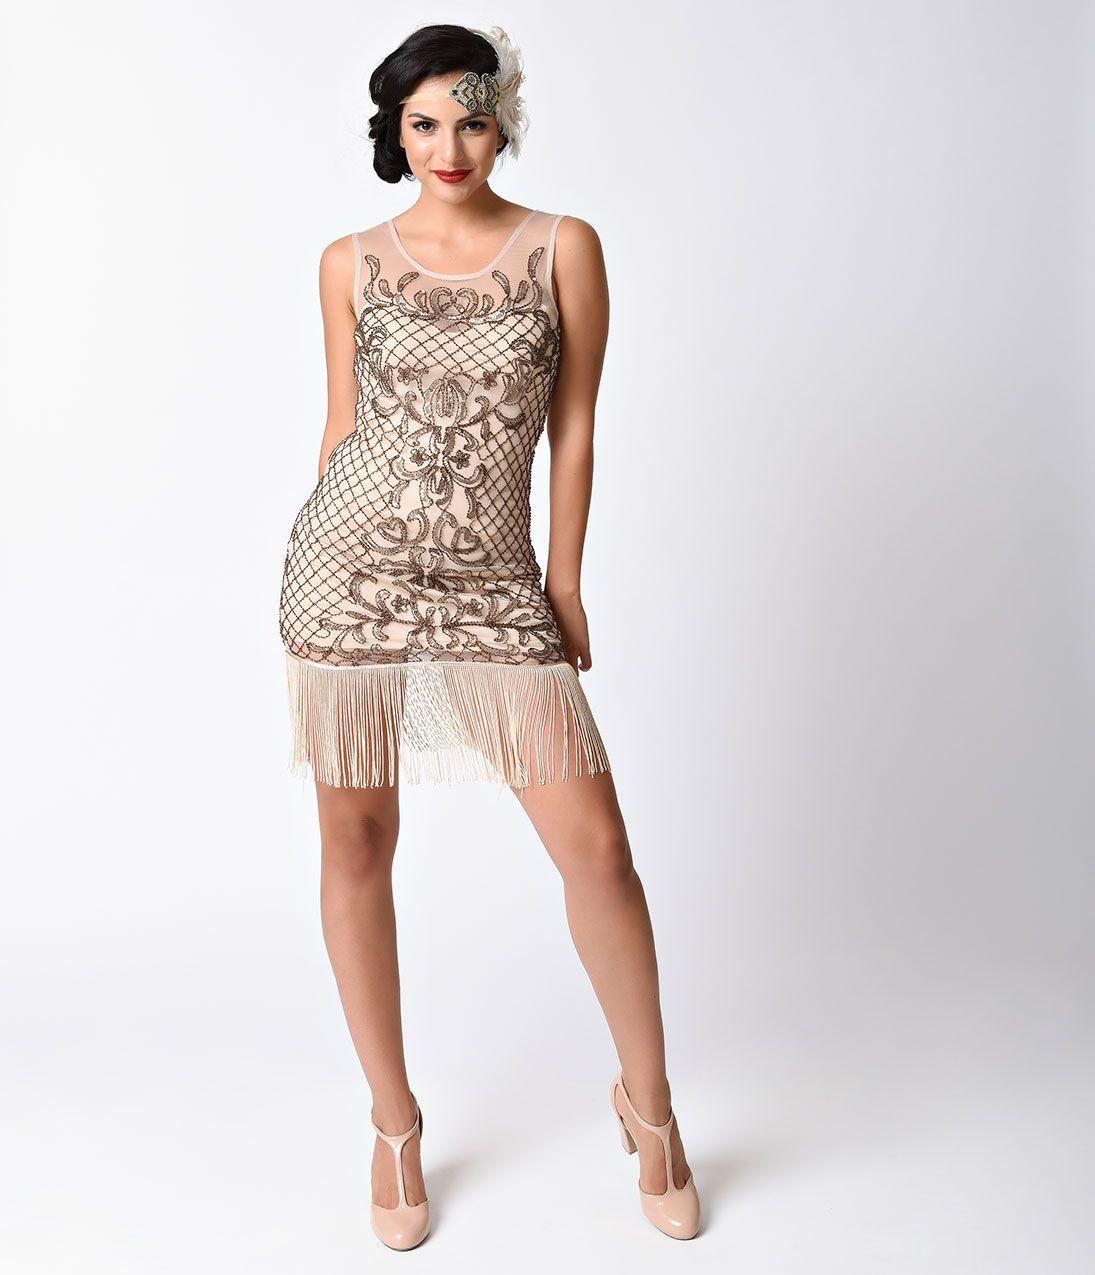 1920s Cocktail Party Dresses Verty 1920s Style Beige Filigree Sleeveless Beaded Flapper Dress Flapper Style Dresses Beige Cocktail Dresses Beaded Flapper Dress [ 1275 x 1095 Pixel ]